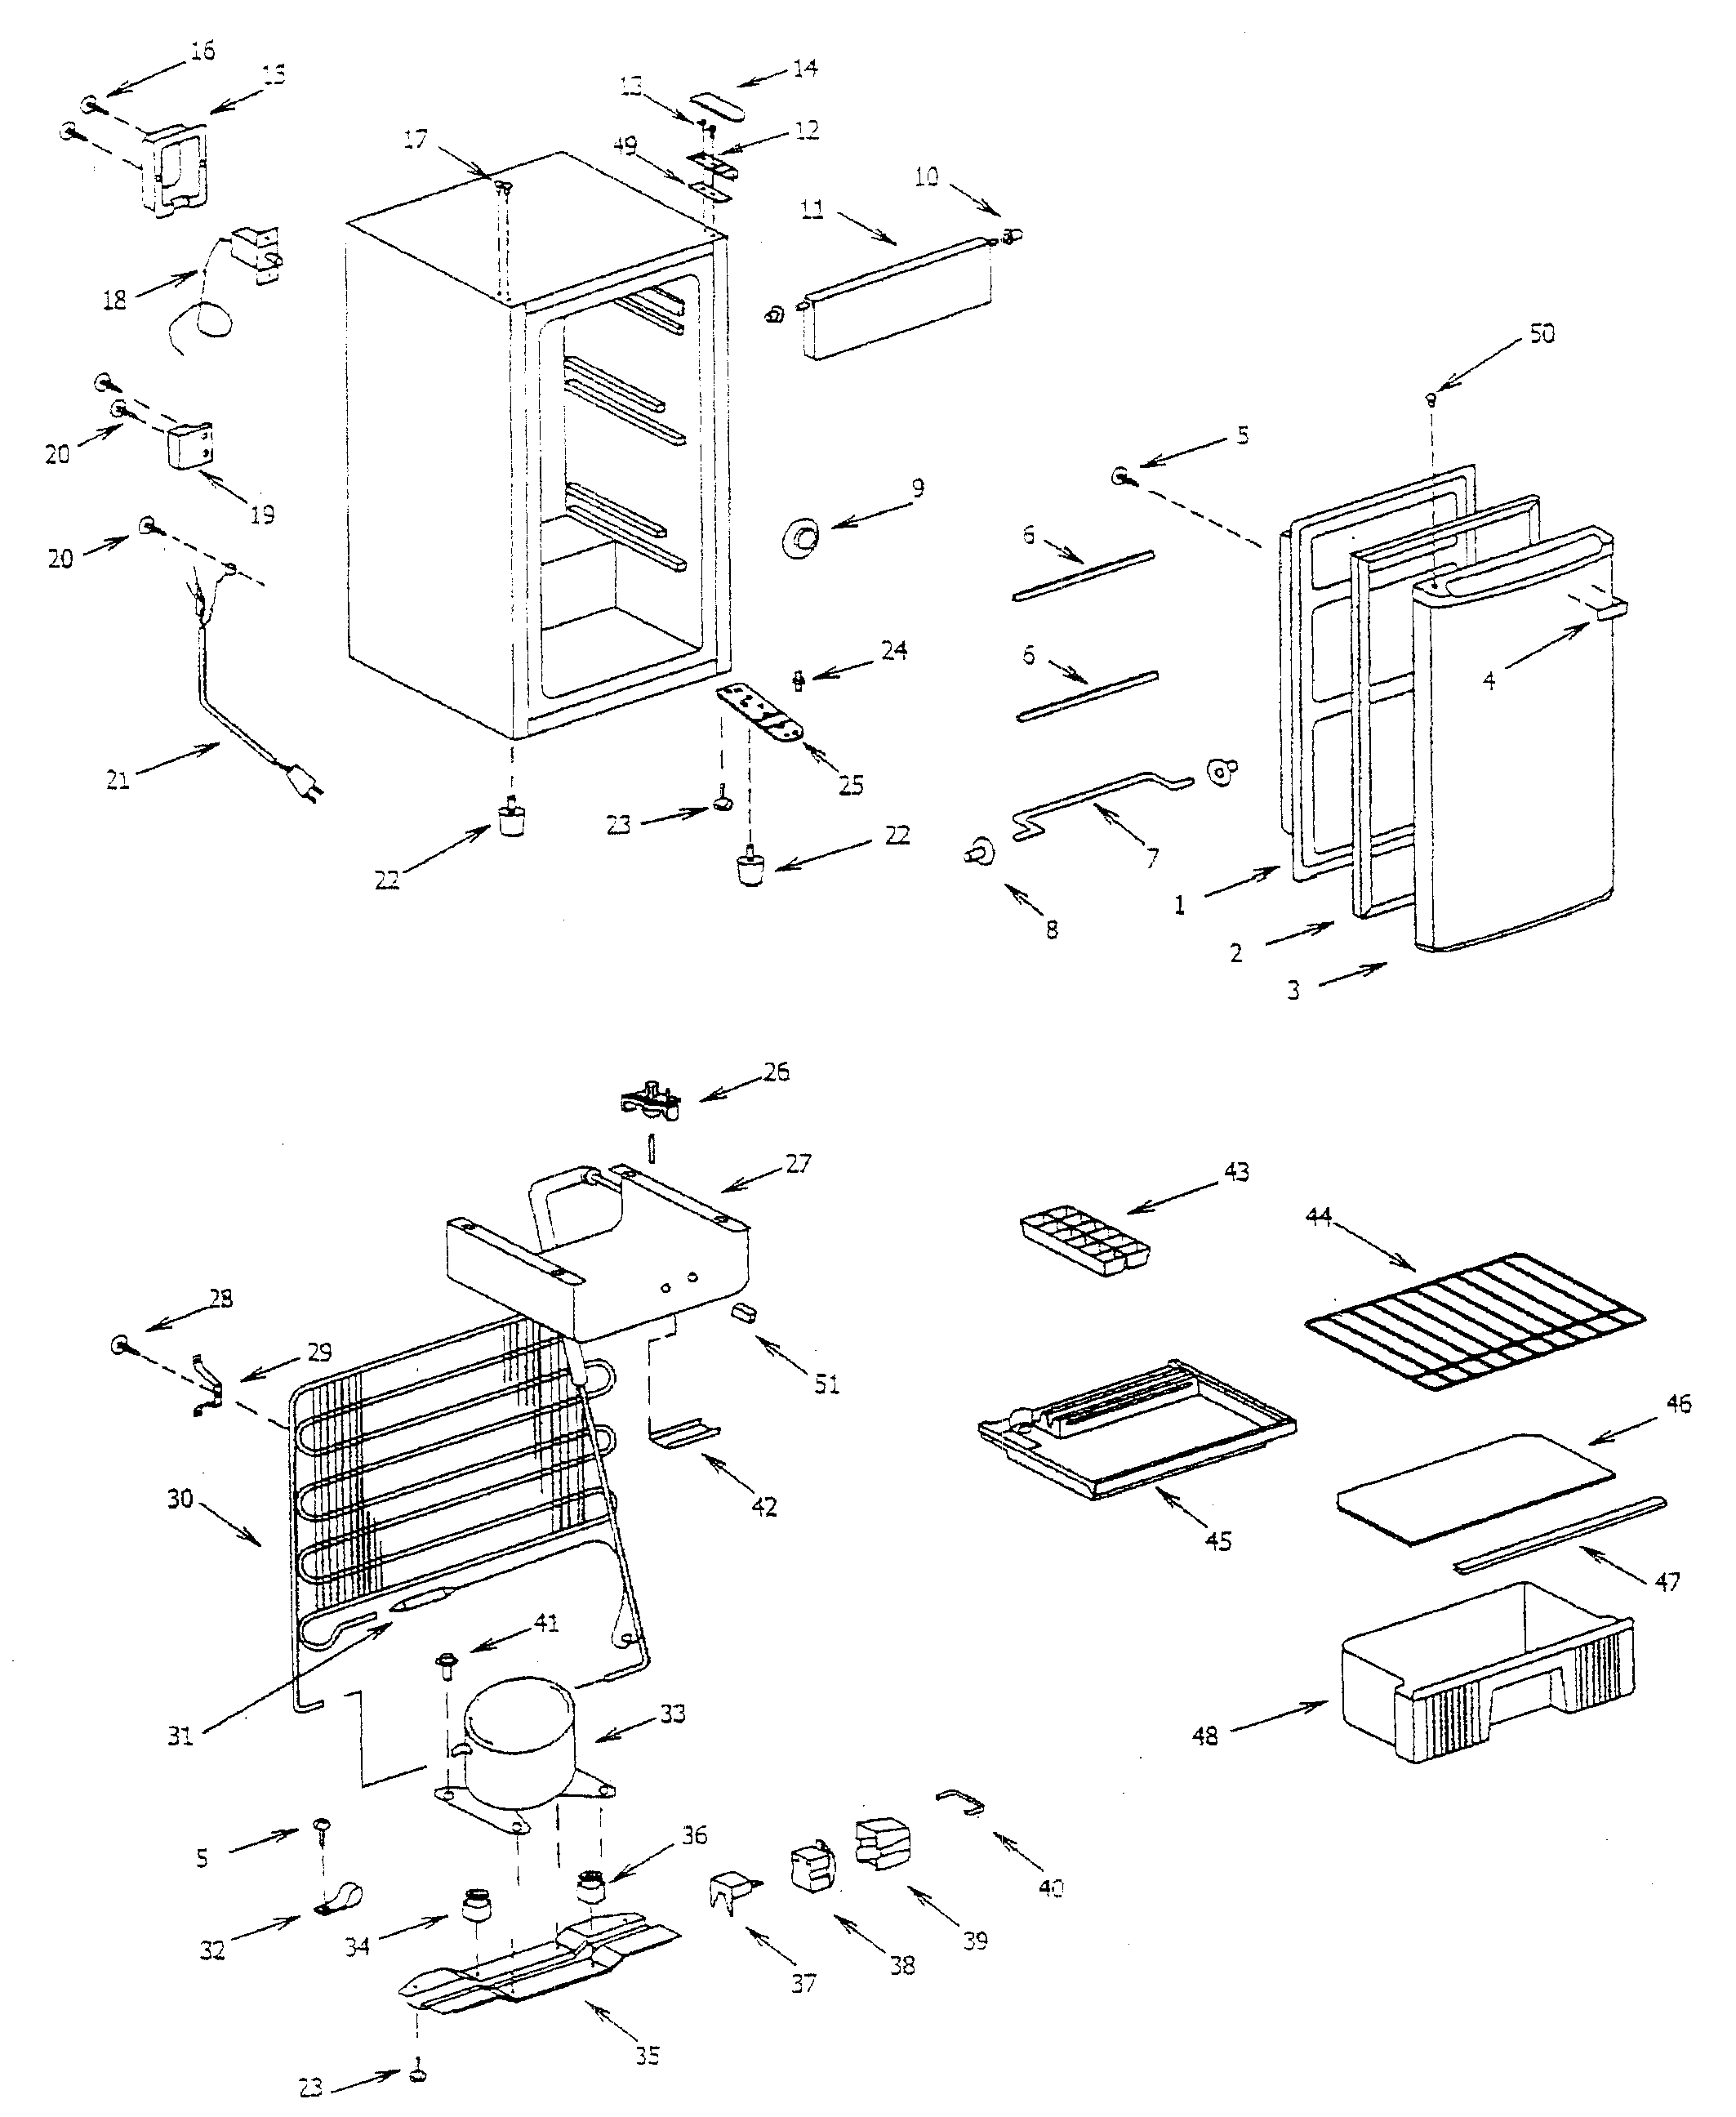 Sanyo Mini Fridge Wiring Diagram. . Wiring Diagram on